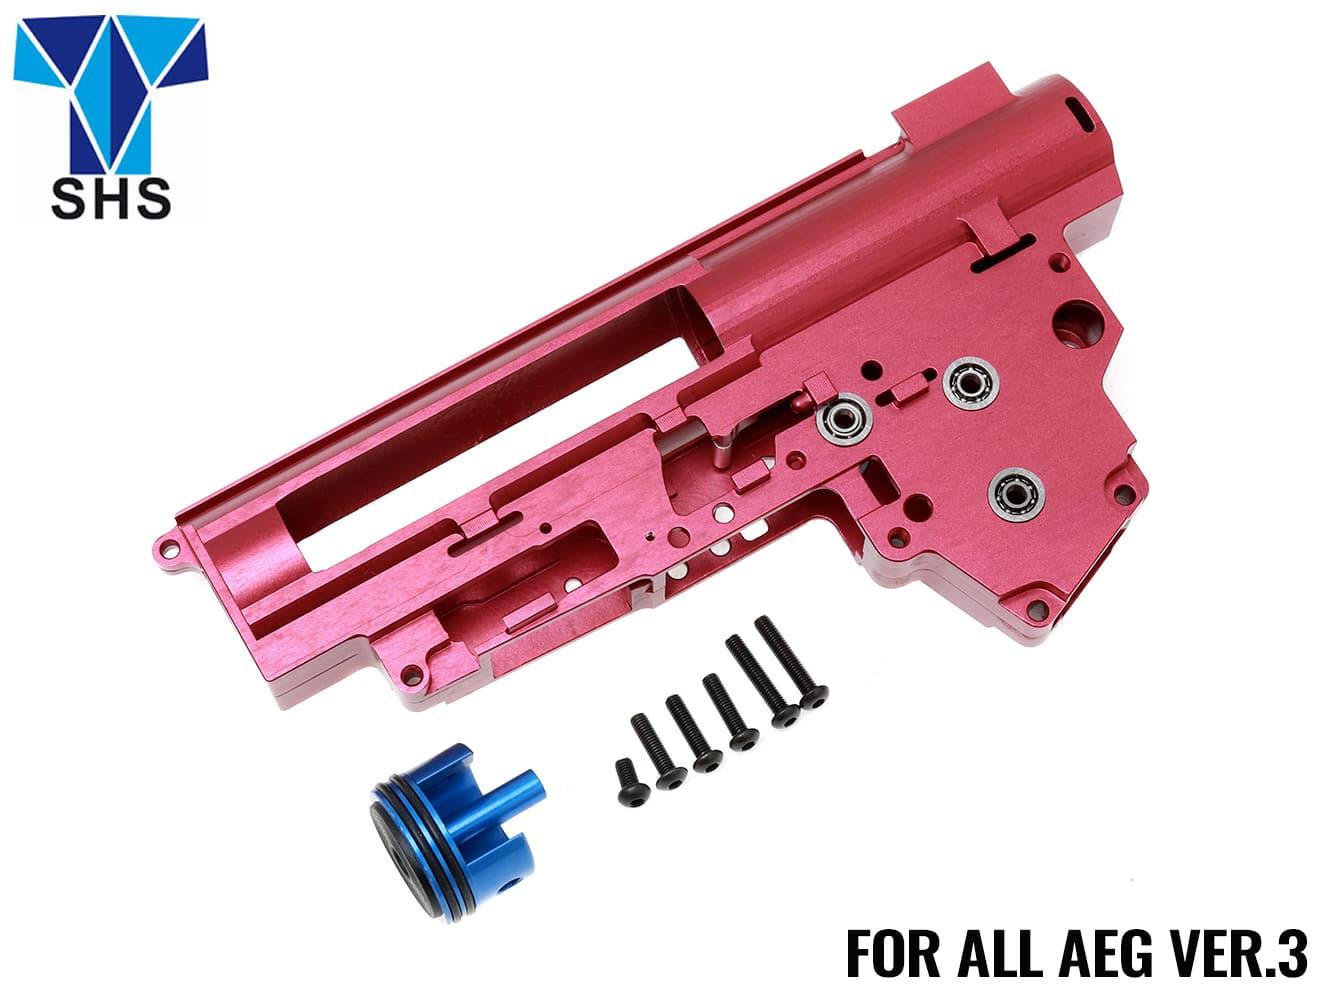 Super Shooter A7075 CNC メカボックス 9mm Ver.3◆電動ガン バージョン3 メカボックス対応 A7075CNC製ハイエンドメカボックス ミリネジ化